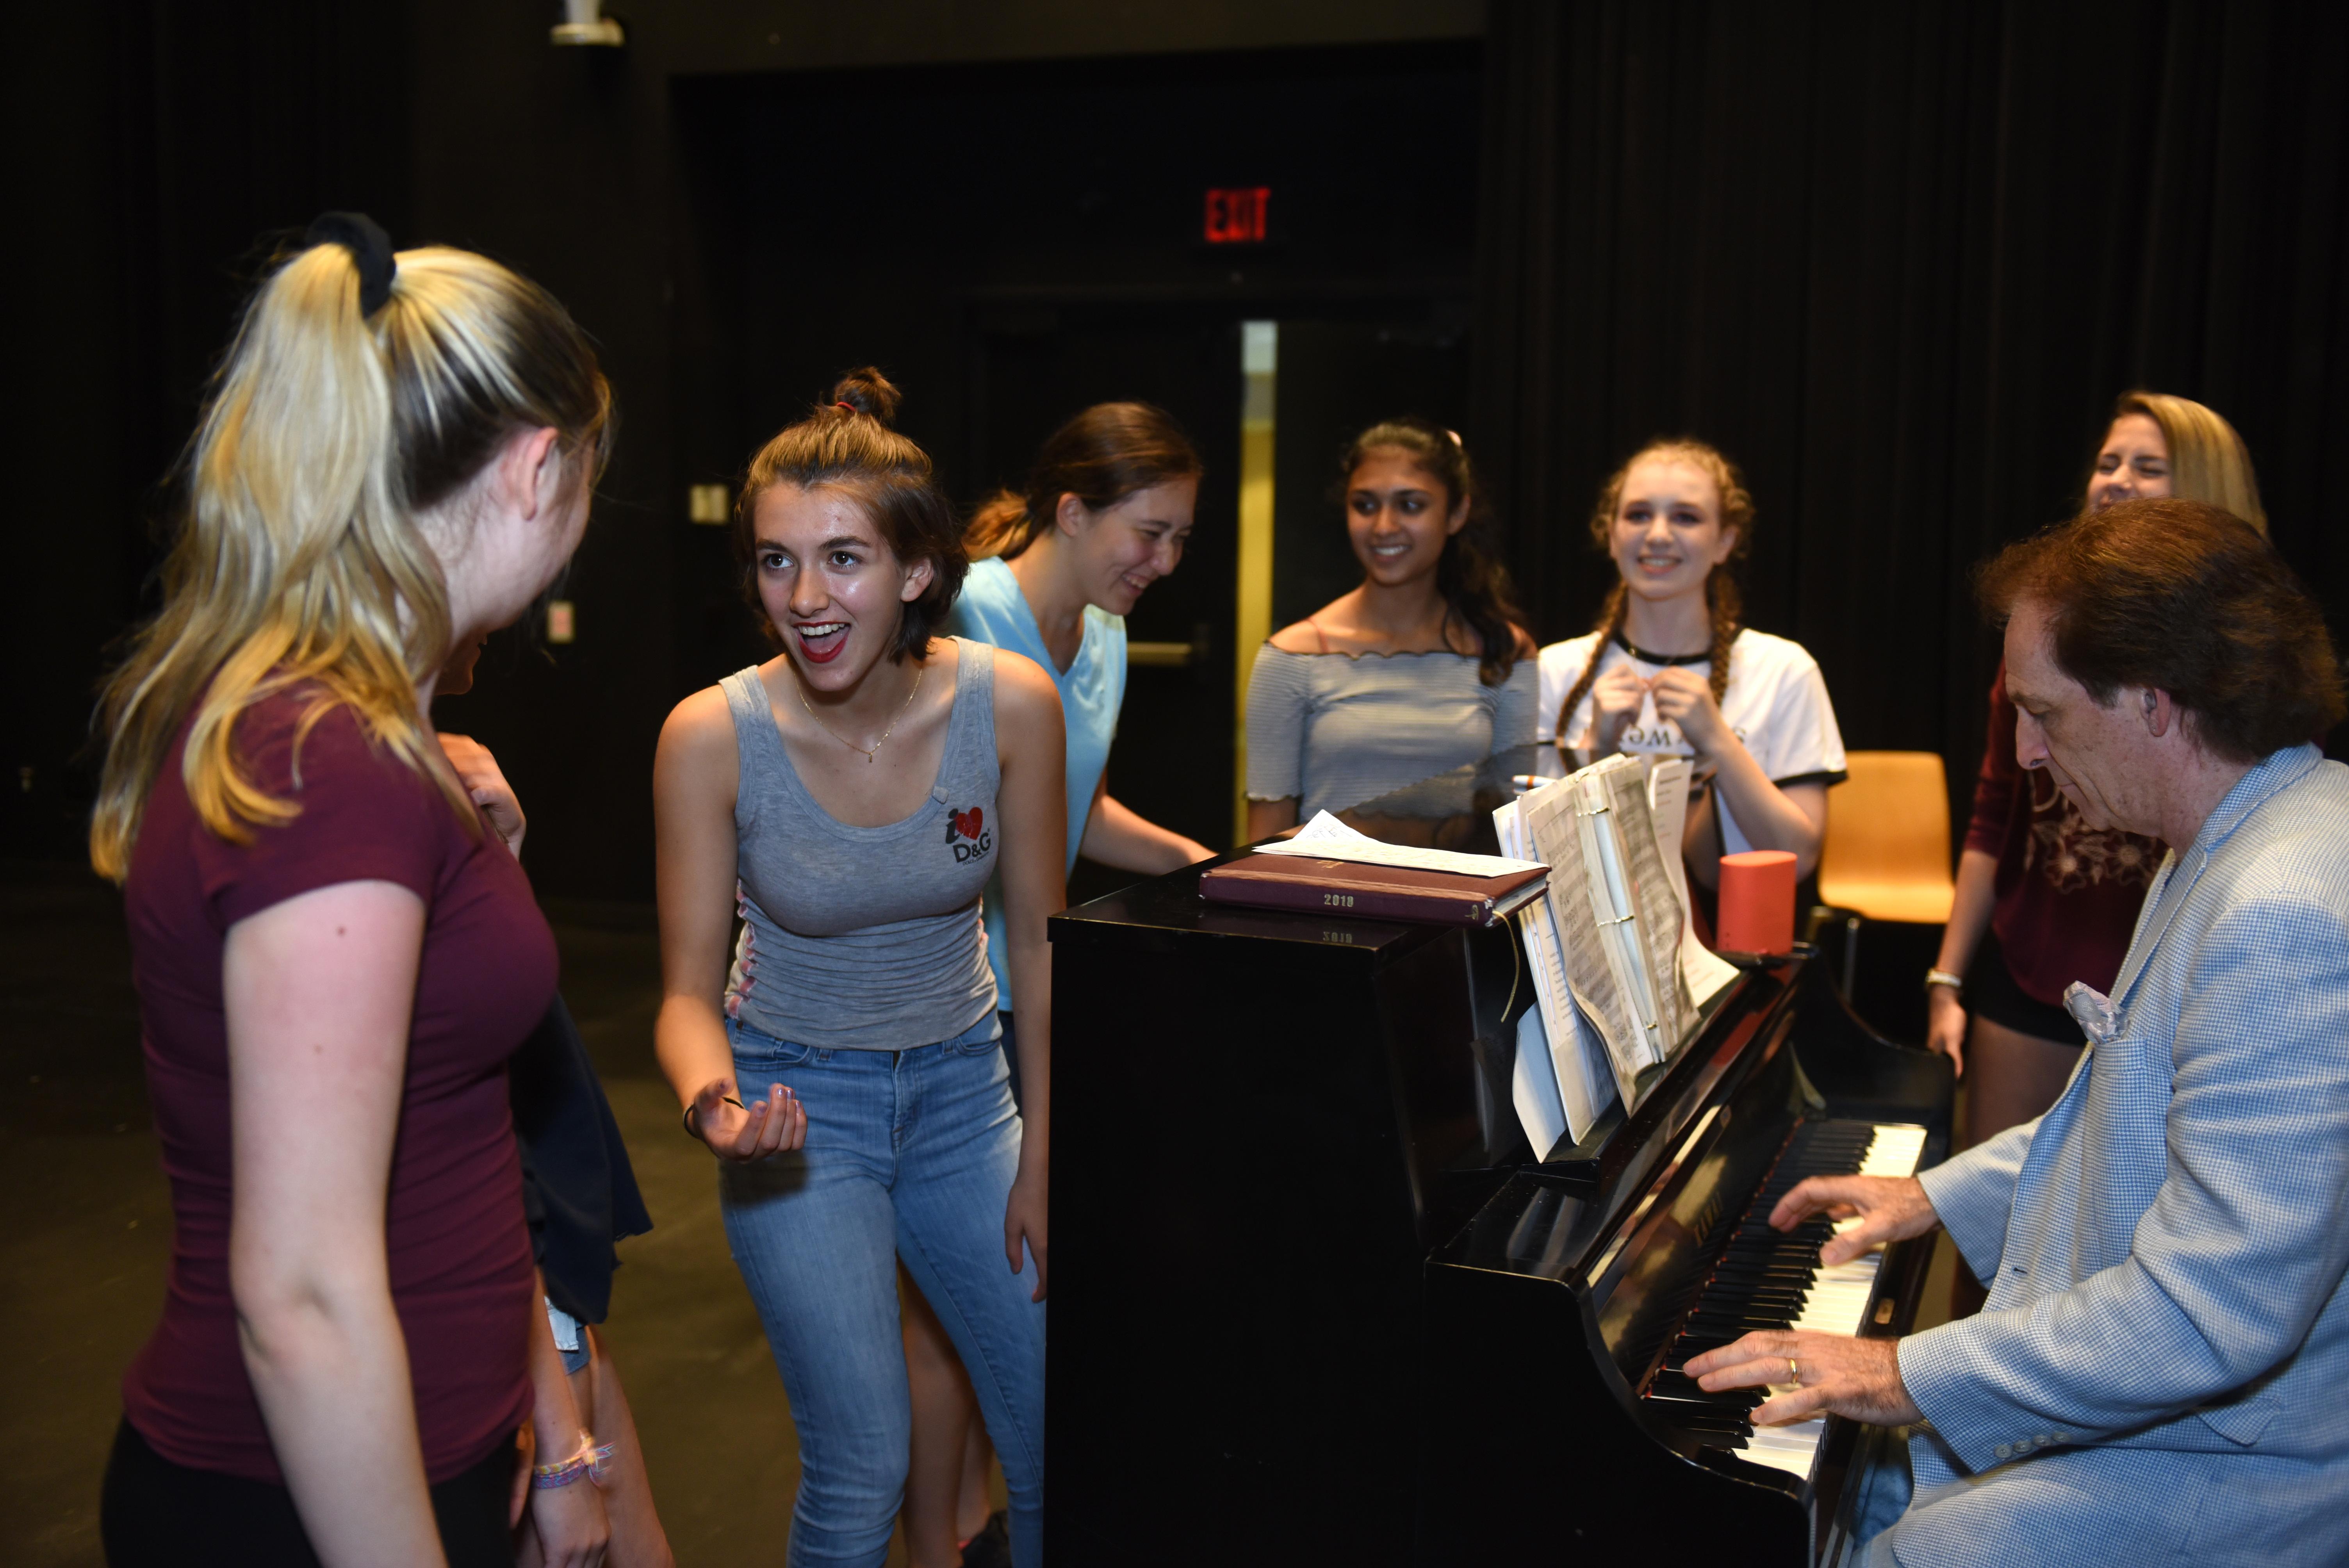 Summer Program - Filmmaking and Digital Media | Adelphi University Summer Pre-College Programs